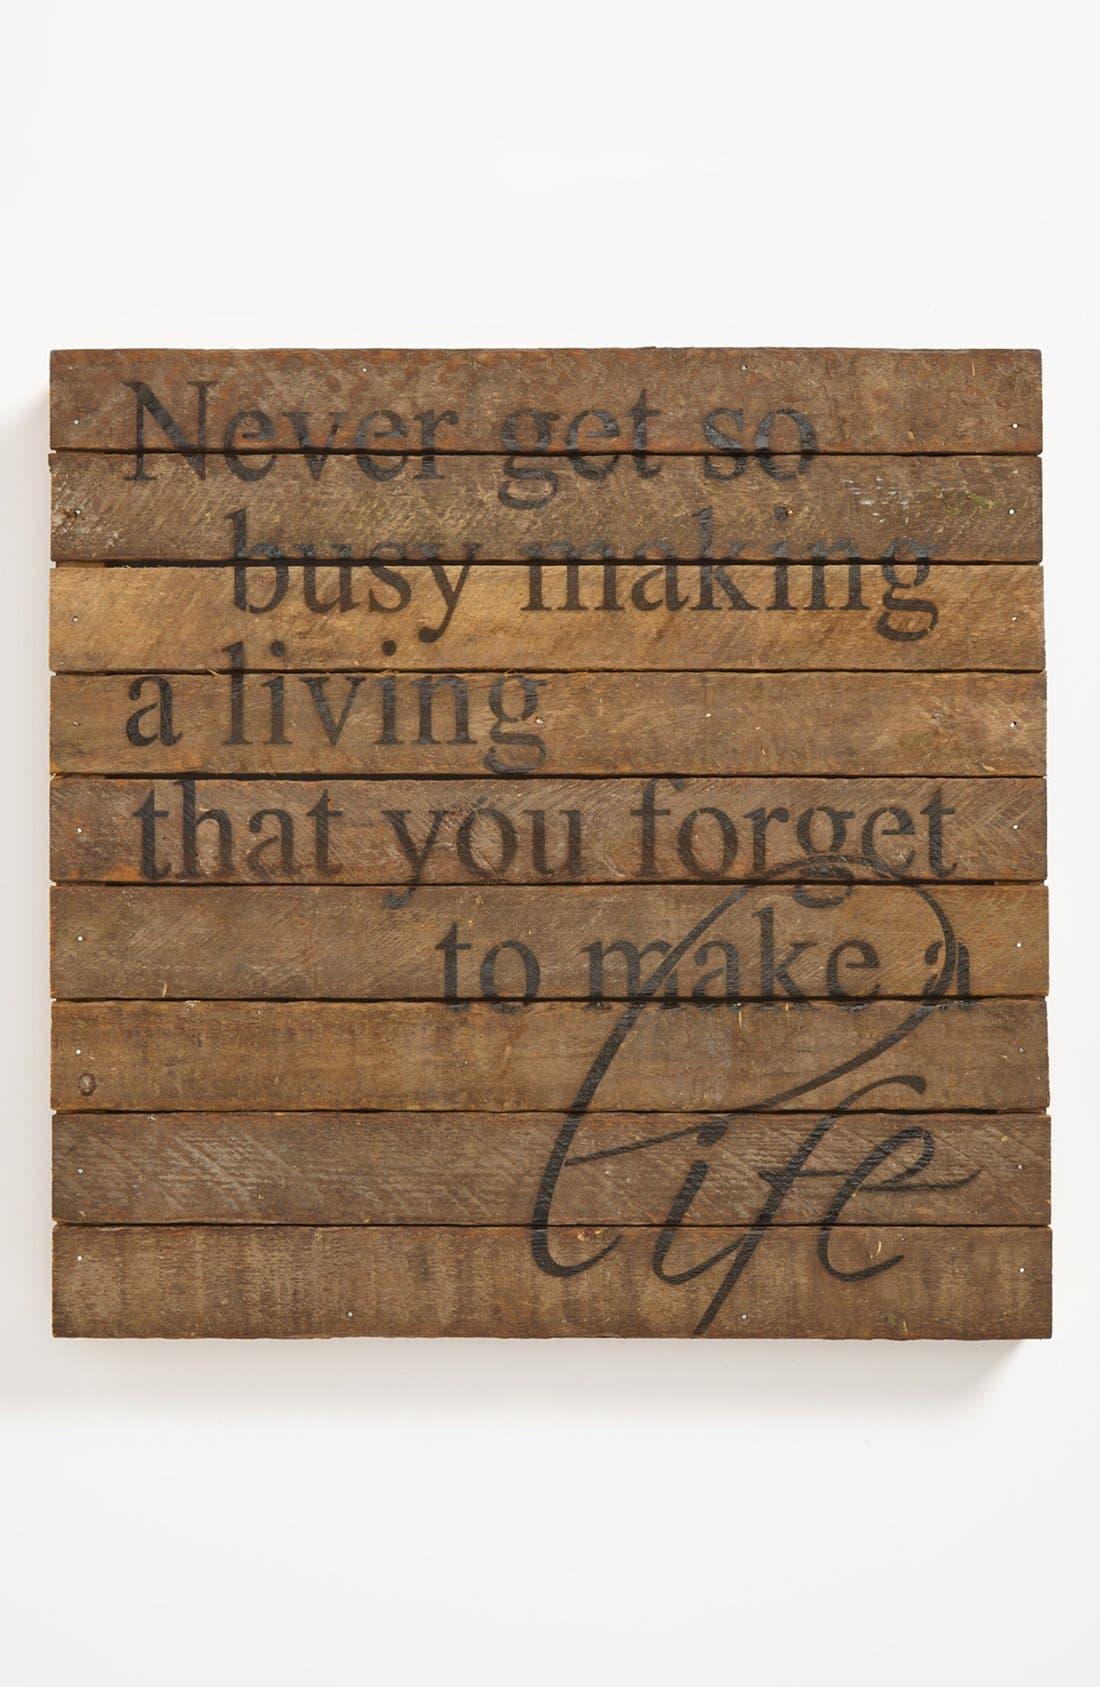 Alternate Image 1 Selected - 'Never Get So Busy' Repurposed Wood Wall Art